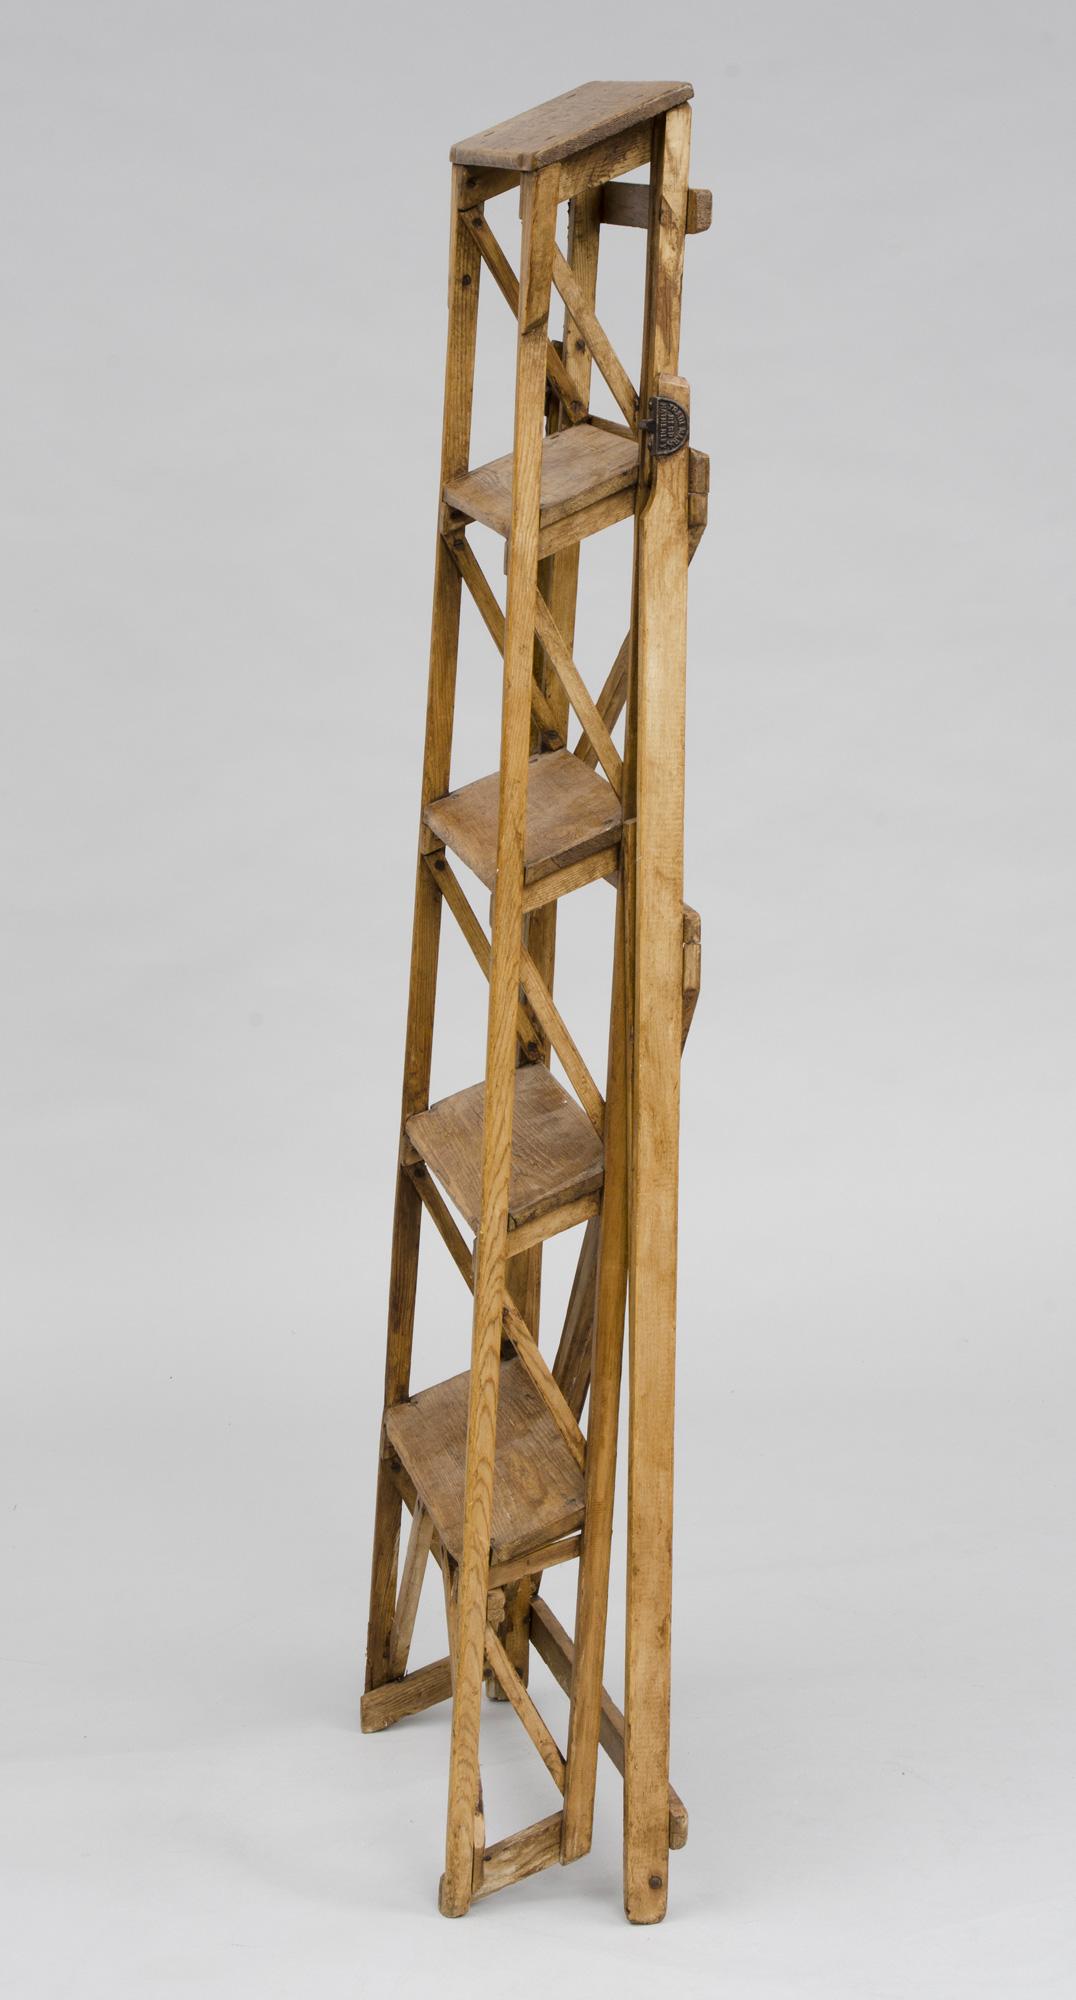 English Antique Pine Ladder The Hatherley Lattistep Patent Ladder